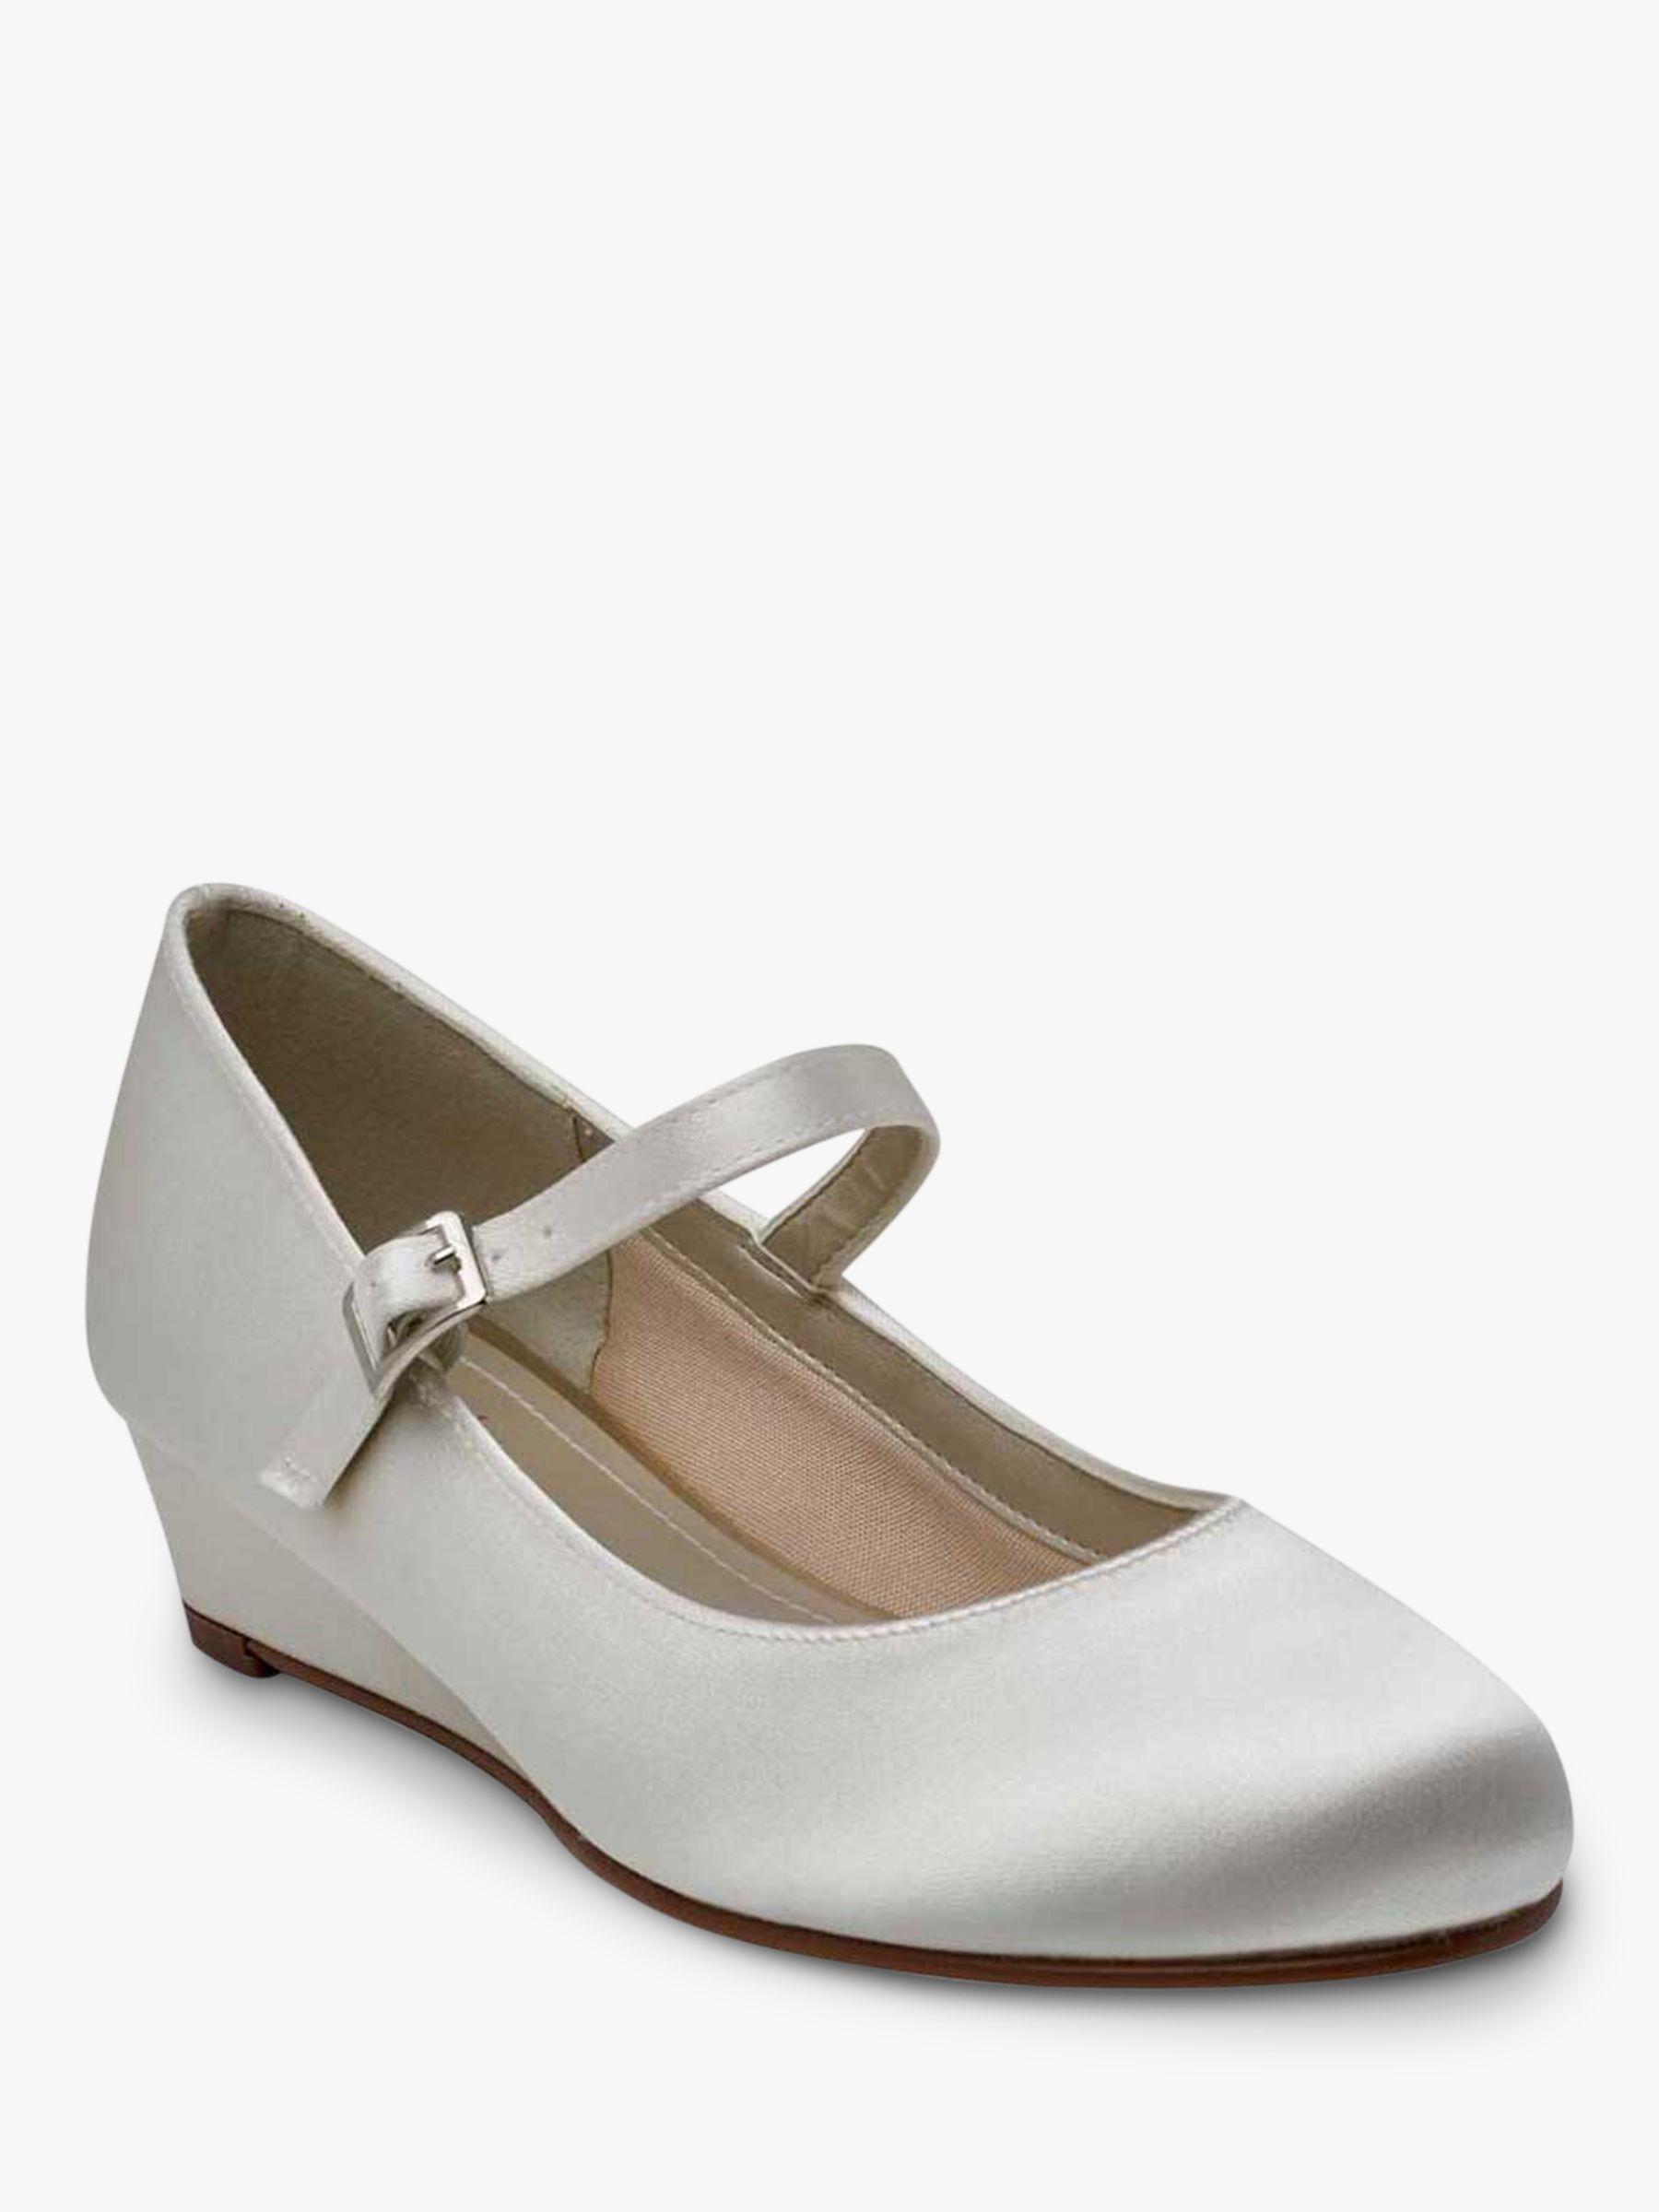 Rainbow Club Rainbow Club Skyla Bridesmaids' Shoes, Ivory